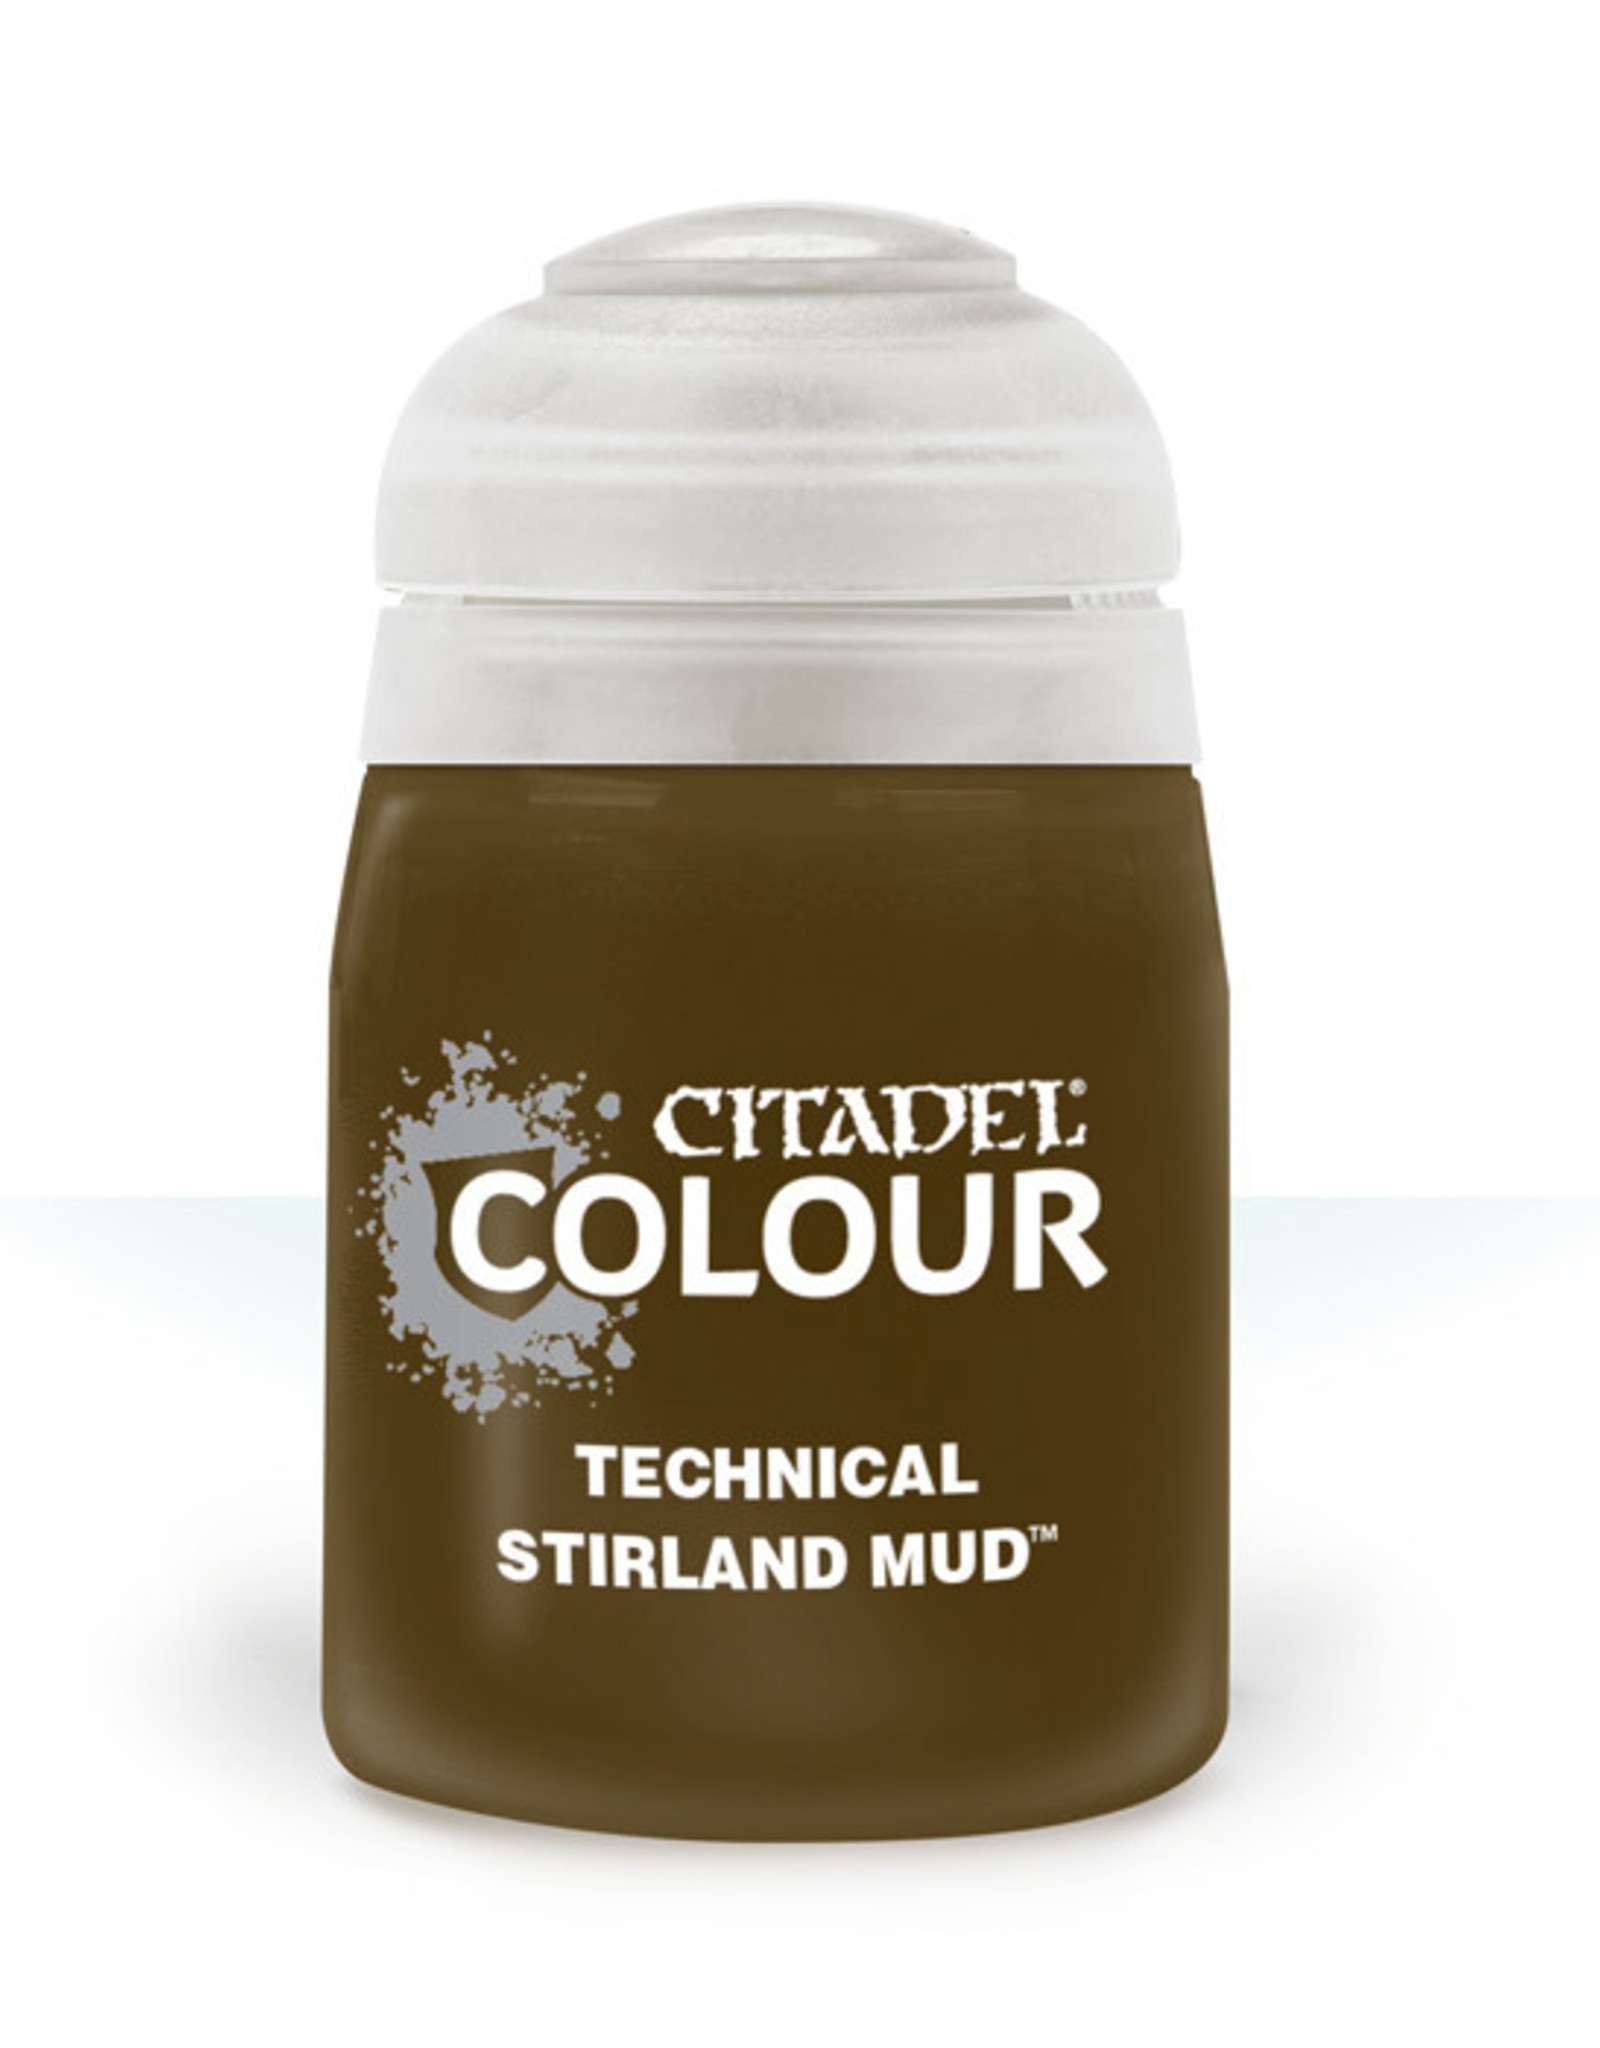 Citadel Citadel Colour: Technical - Stirland Mud